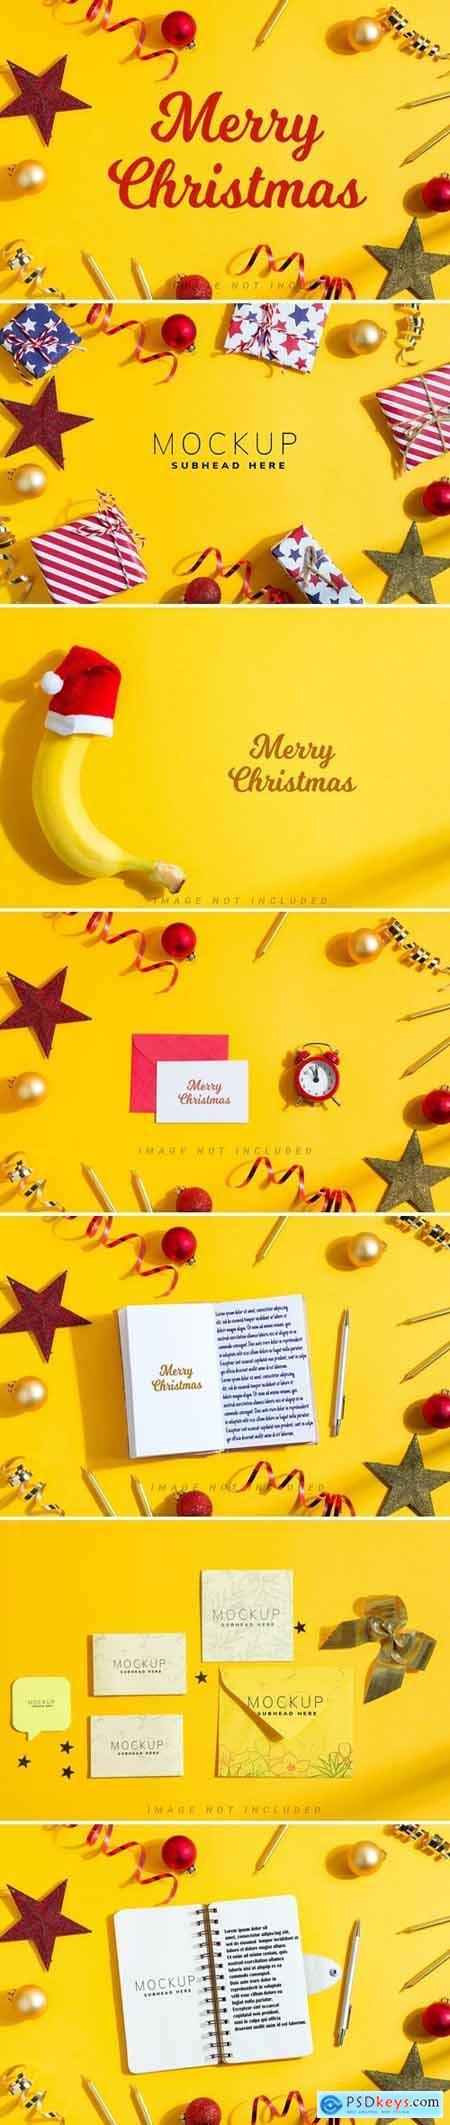 Merry Christmas yellow mockup